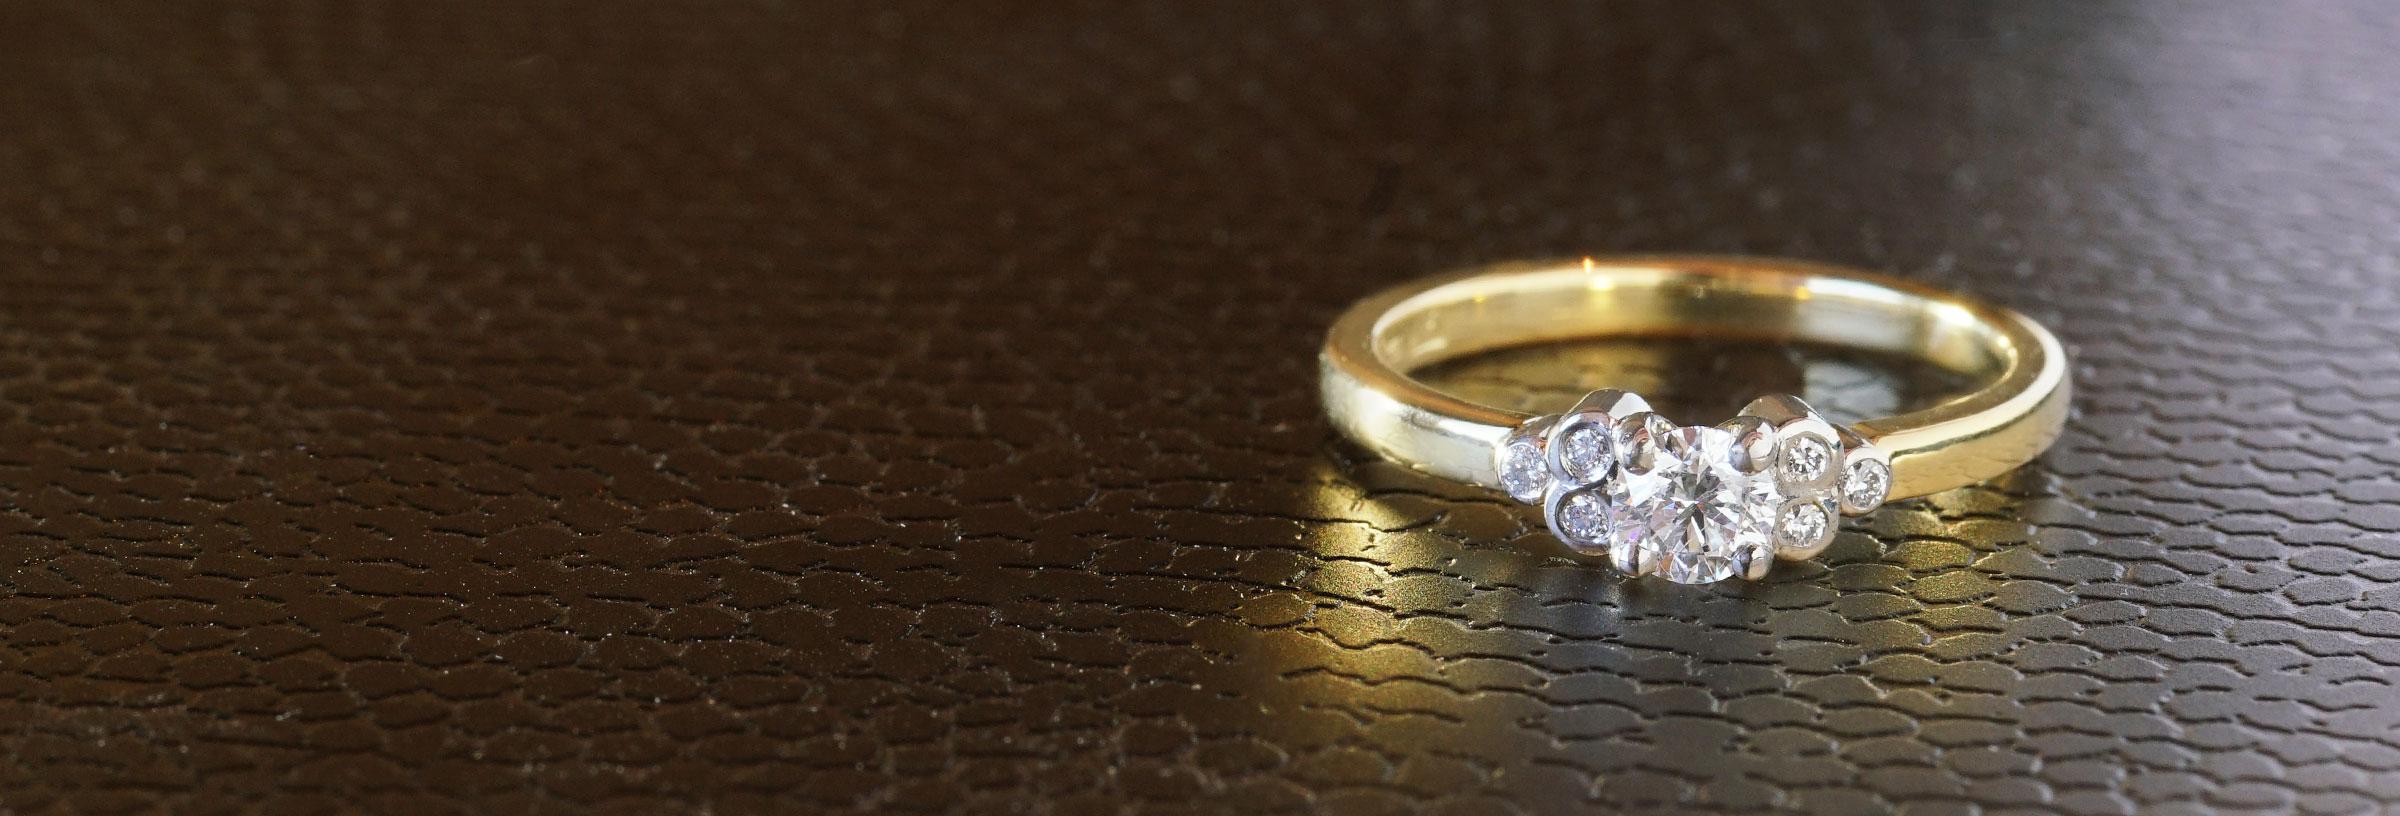 vintage-inspired-palladium-yellow-gold-and-diamond-engagement-ring